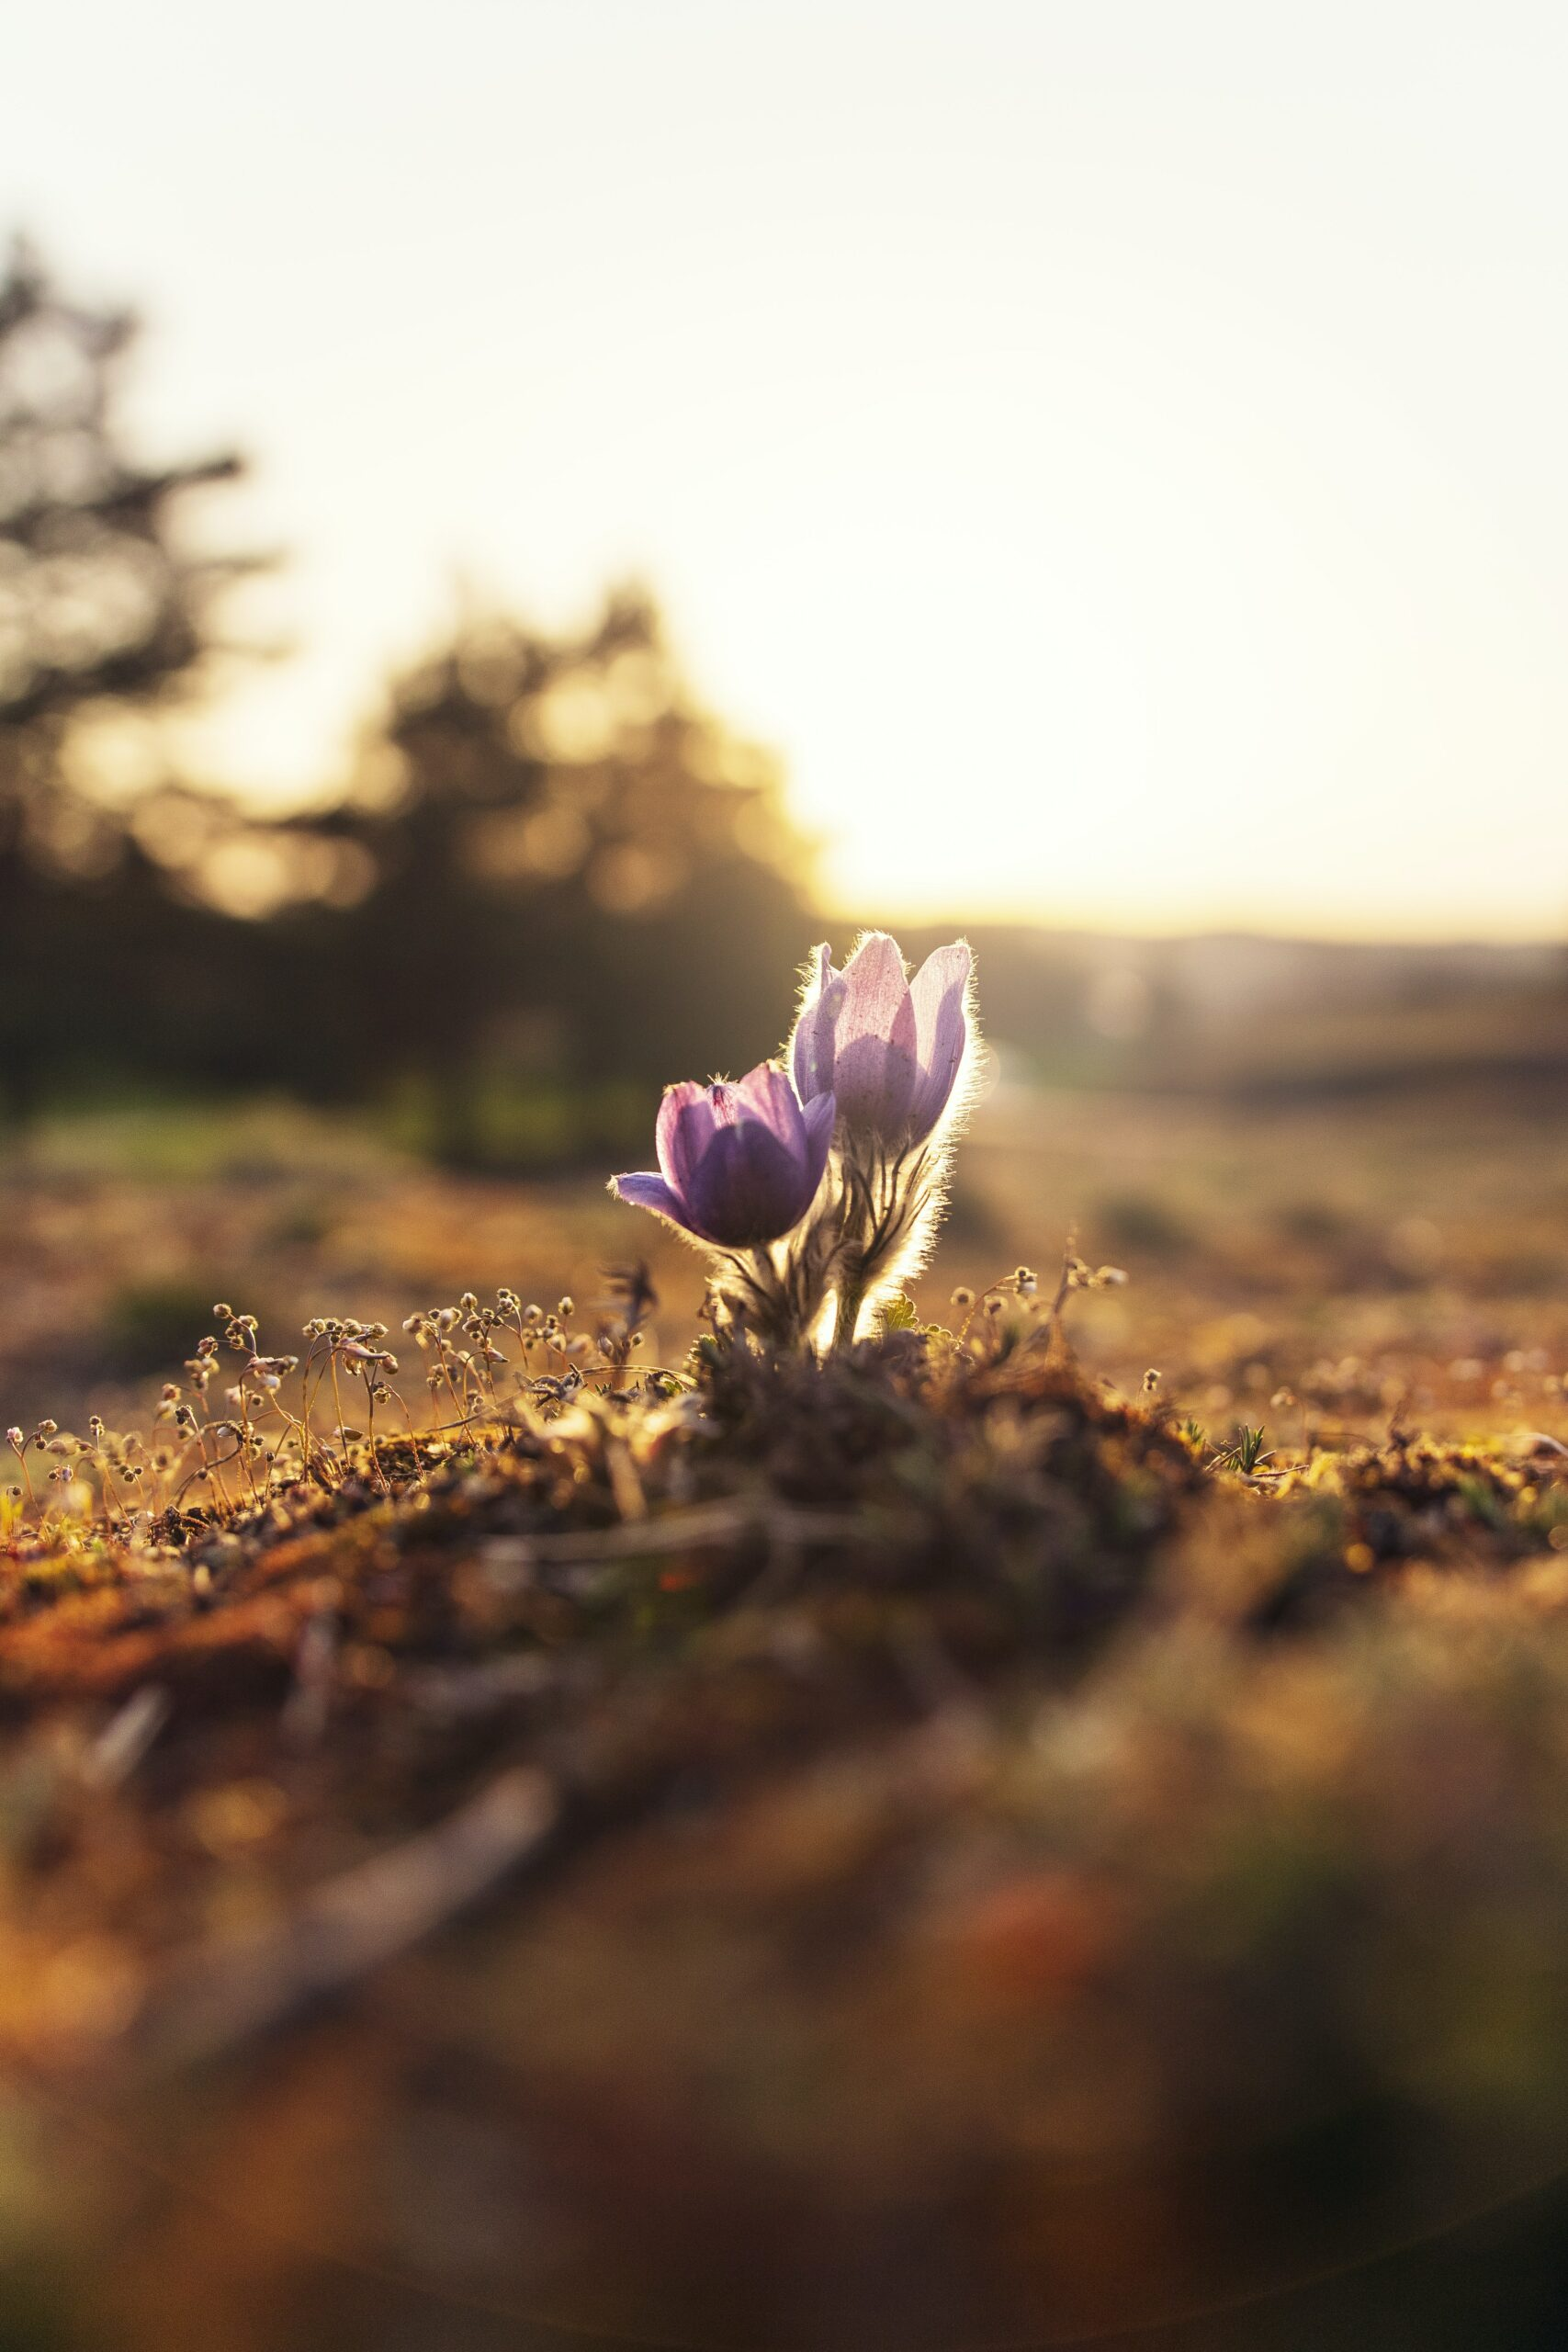 growing flower